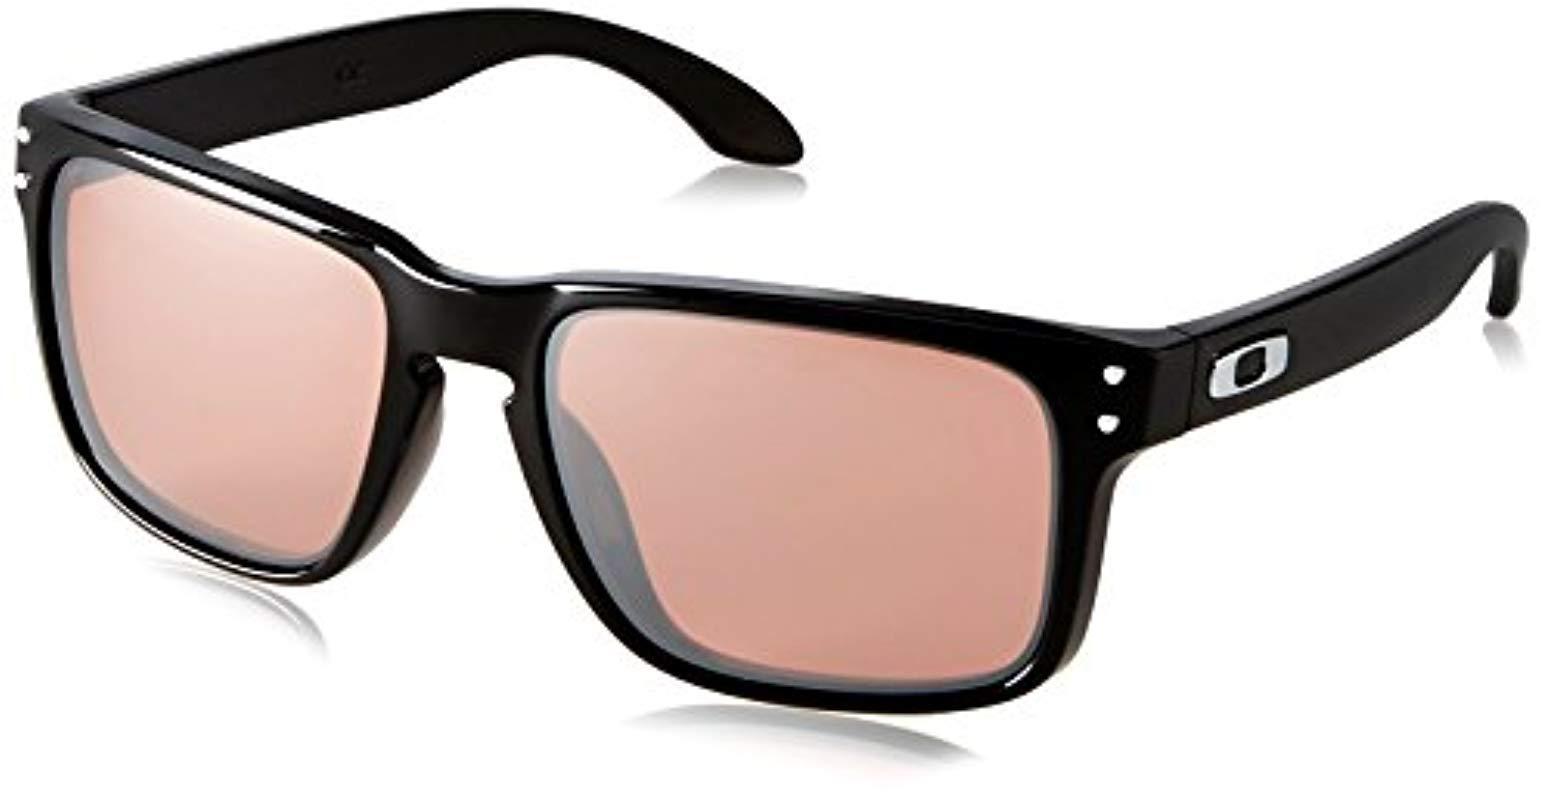 cbbe0d03216c9 Oakley. Men s Black Holbrook Non-polarized Iridium Rectangular Sunglasses